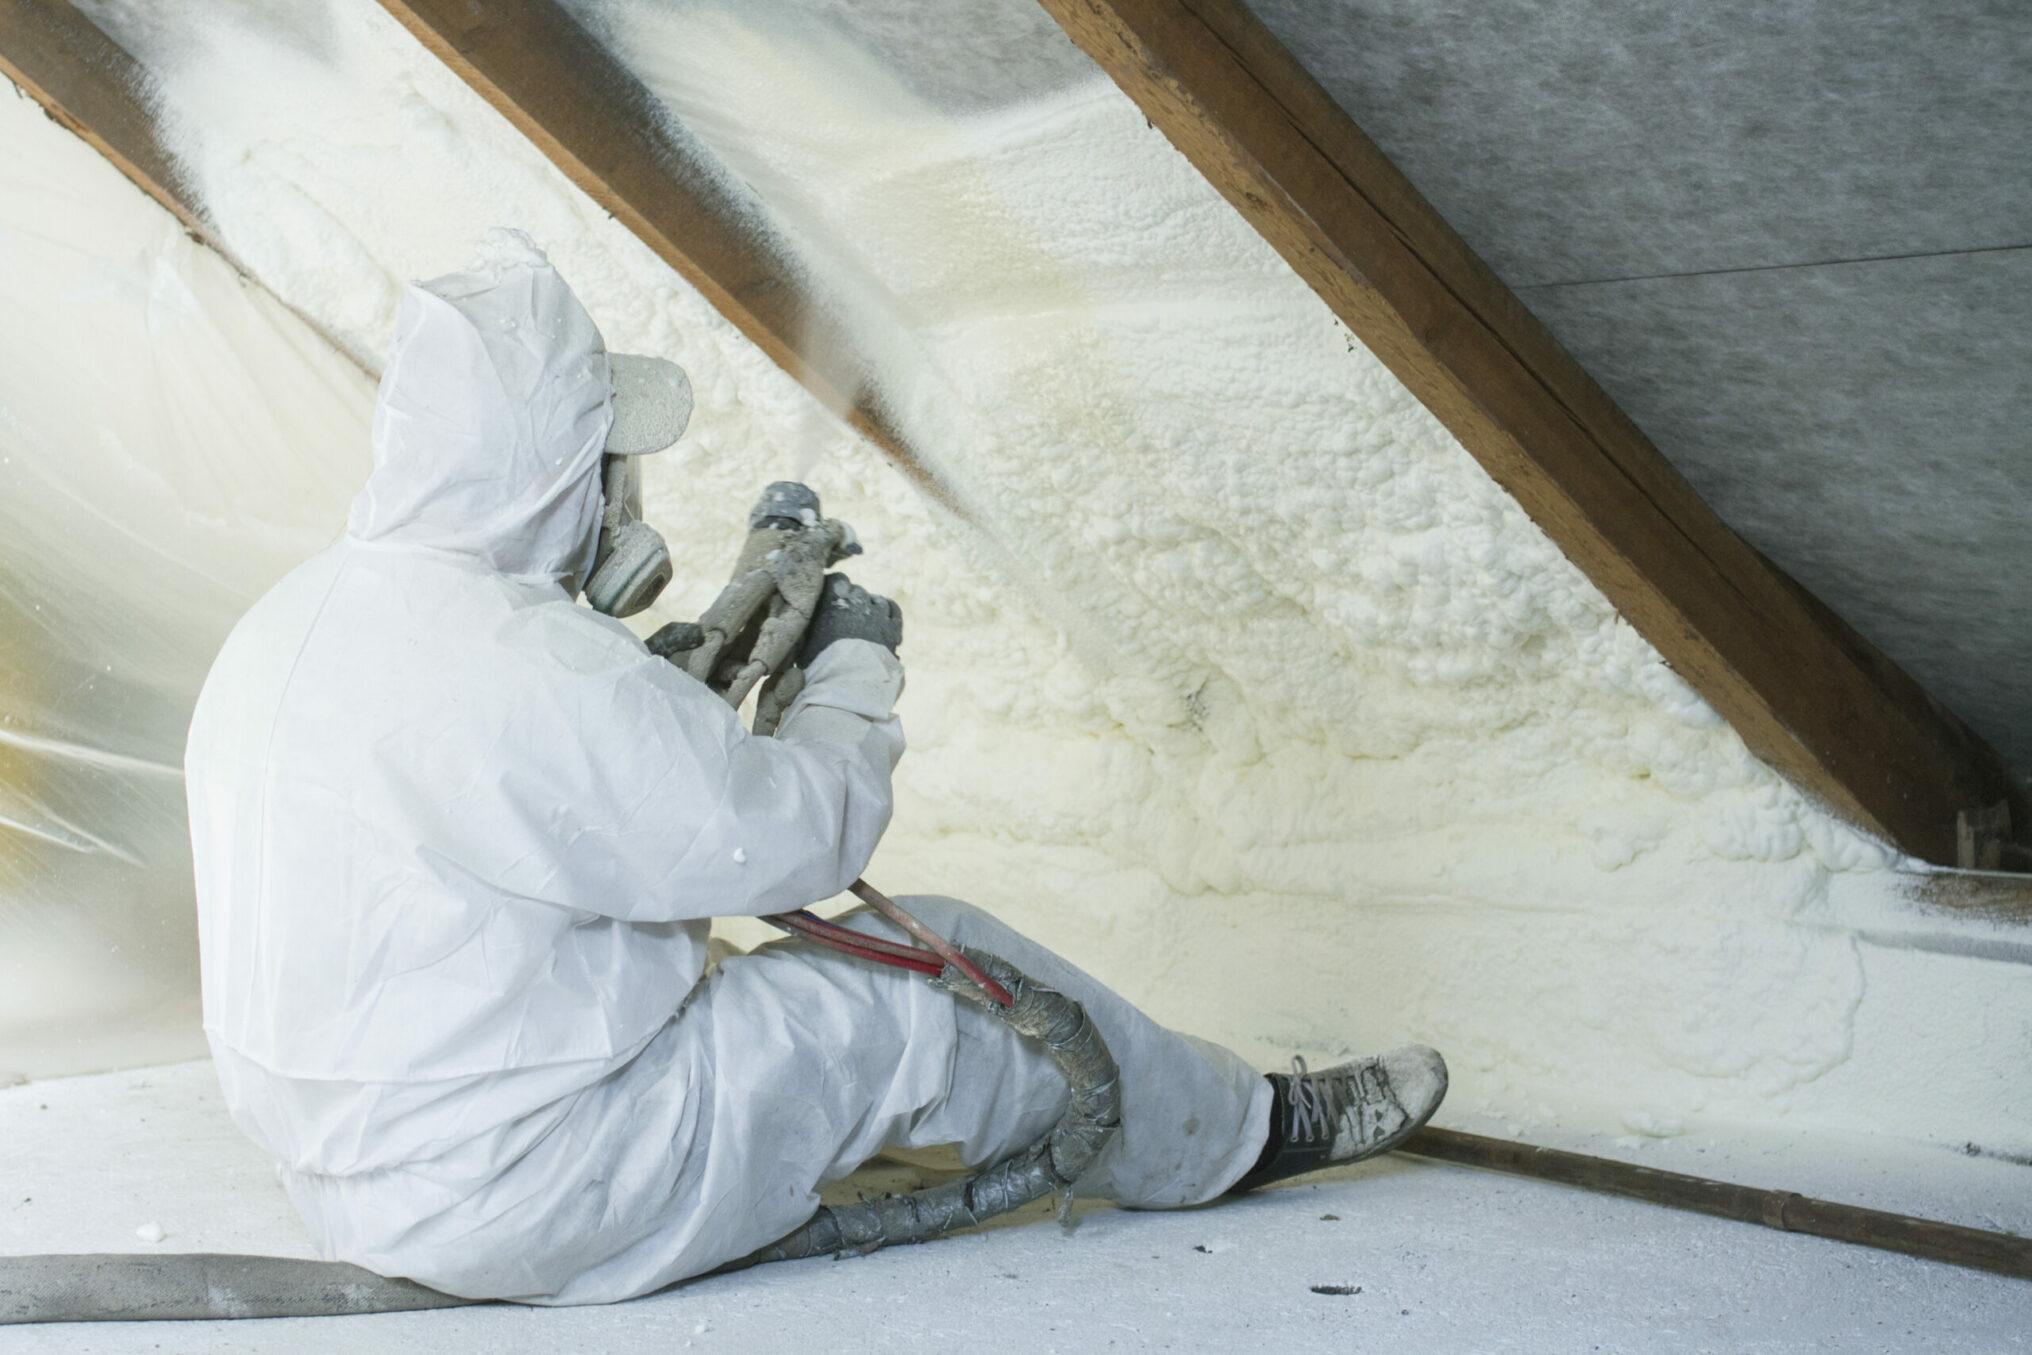 spray polyurethane foam for roof - technician spraying foam insulation using plural component gun for polyurethane foam, inside